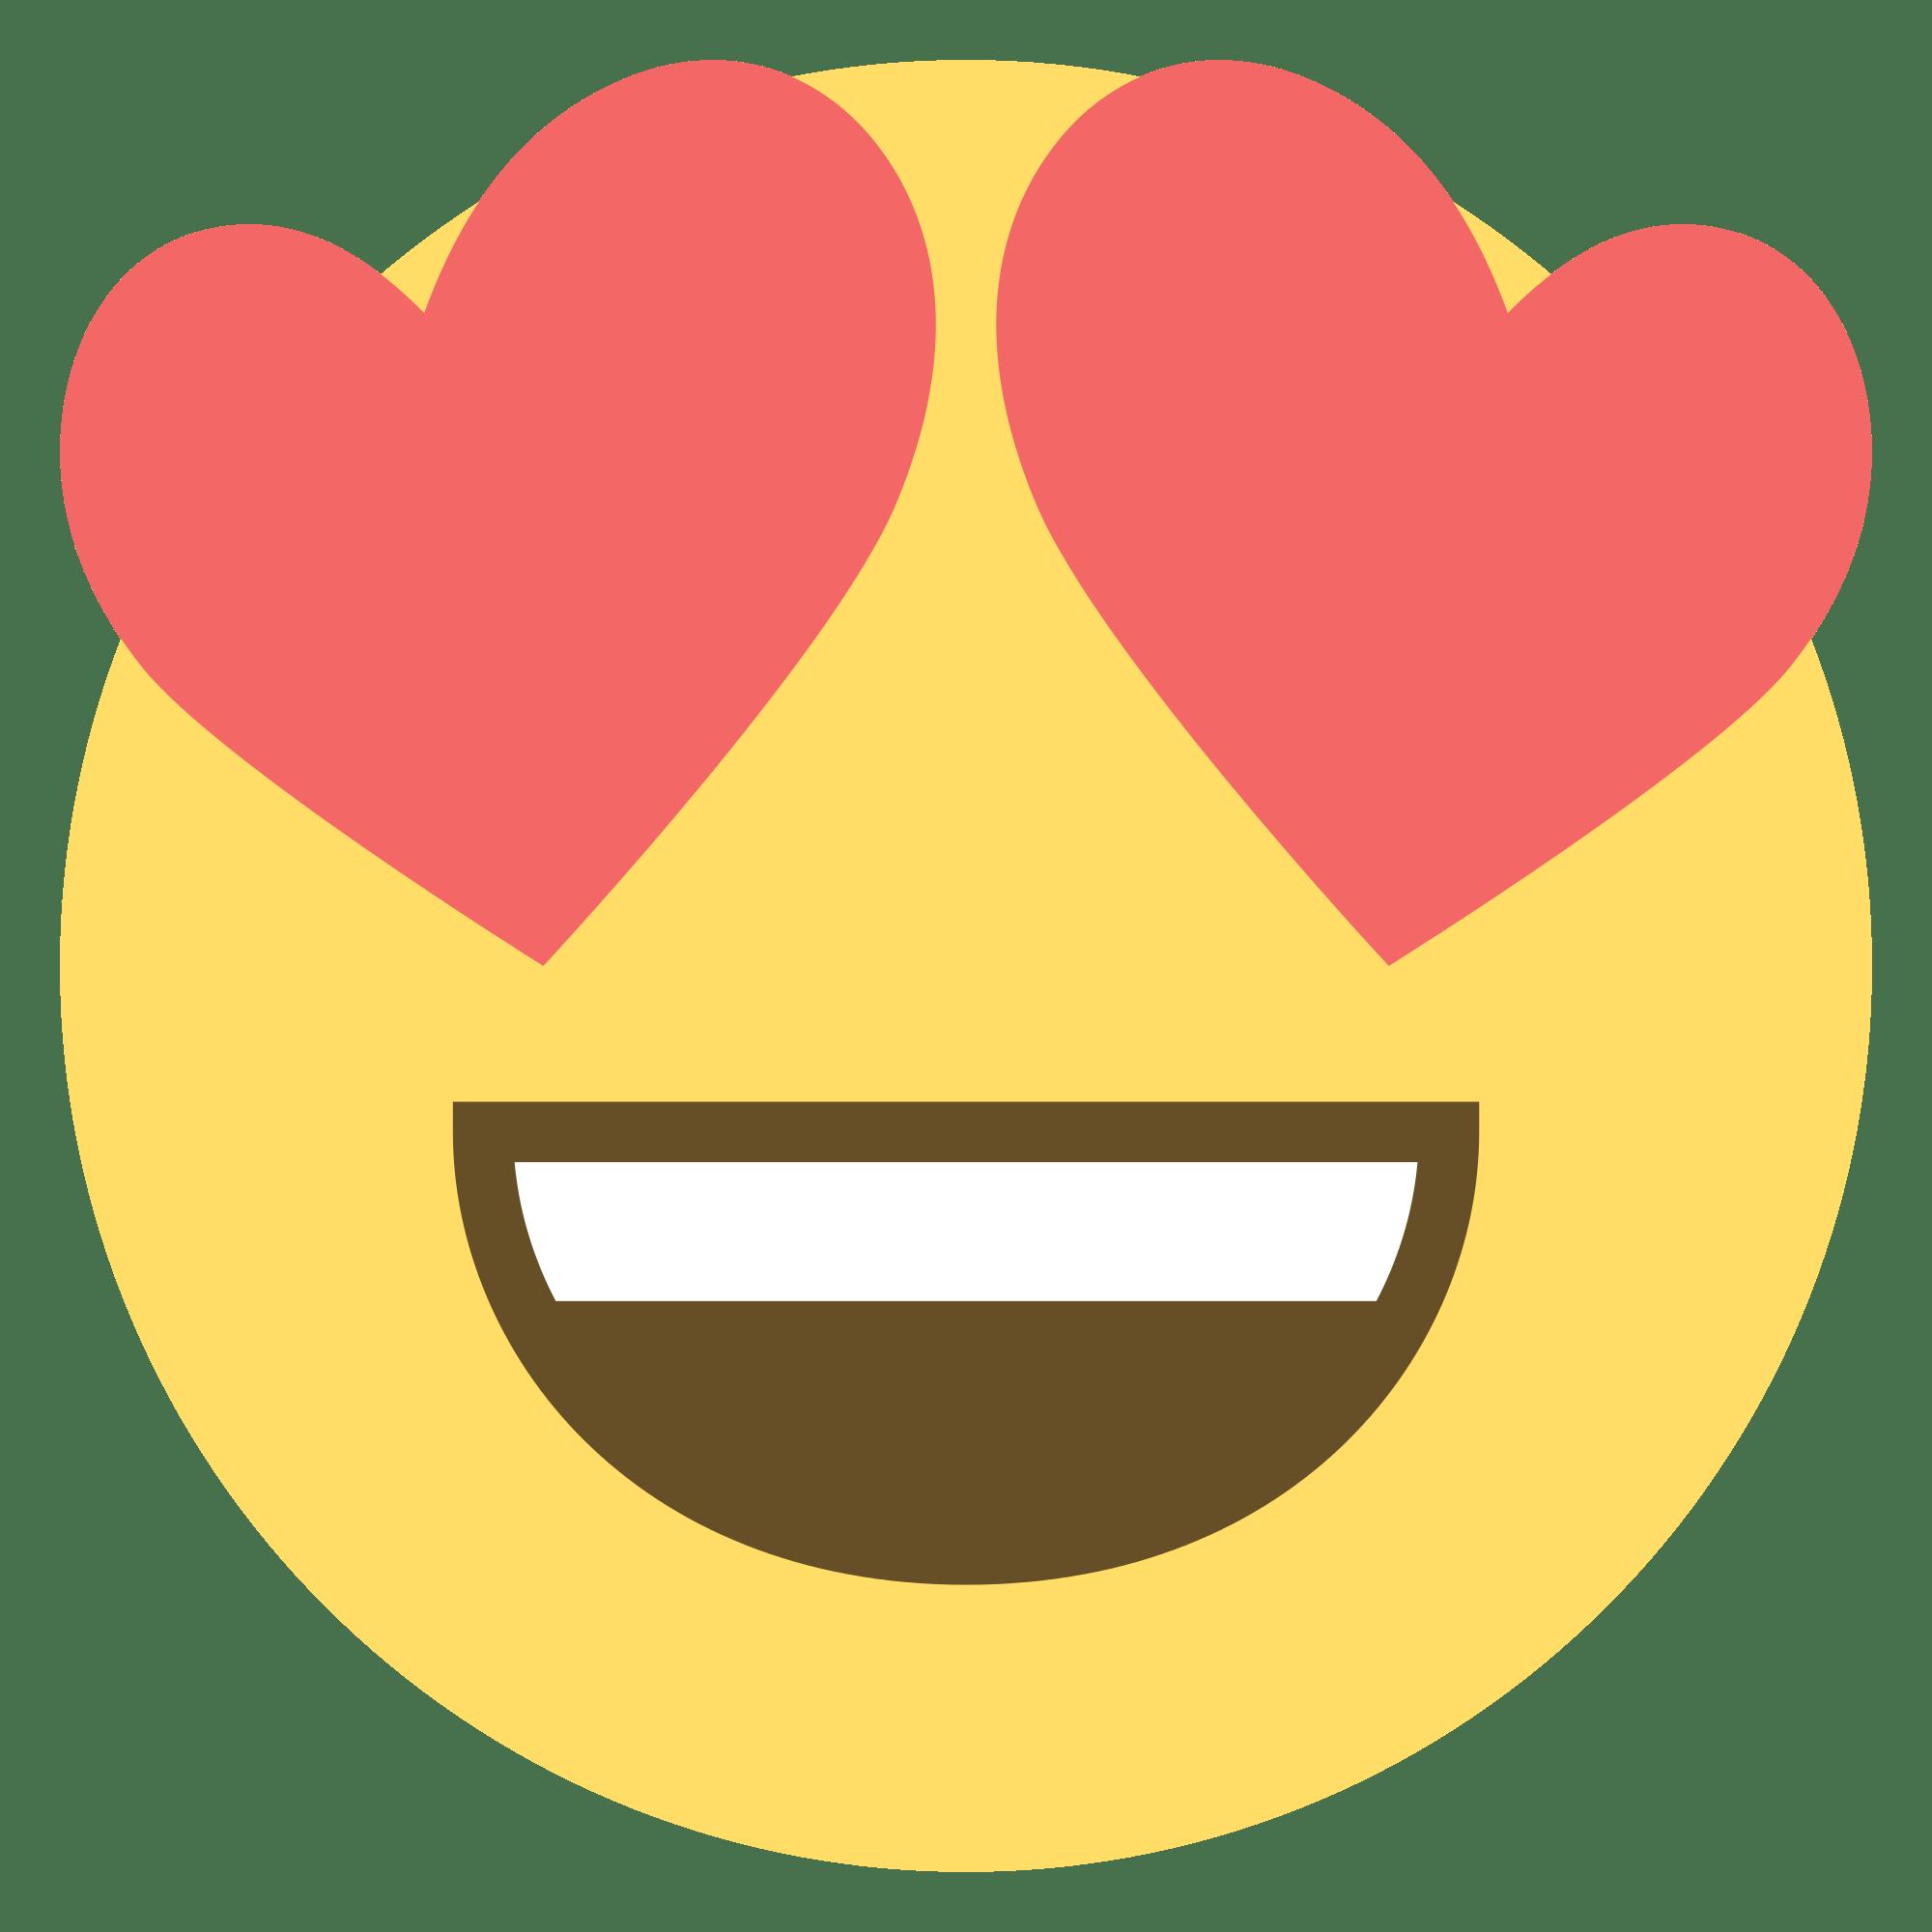 Heart eye emoji clipart clip freeuse Love Emoji Png Heart clip freeuse